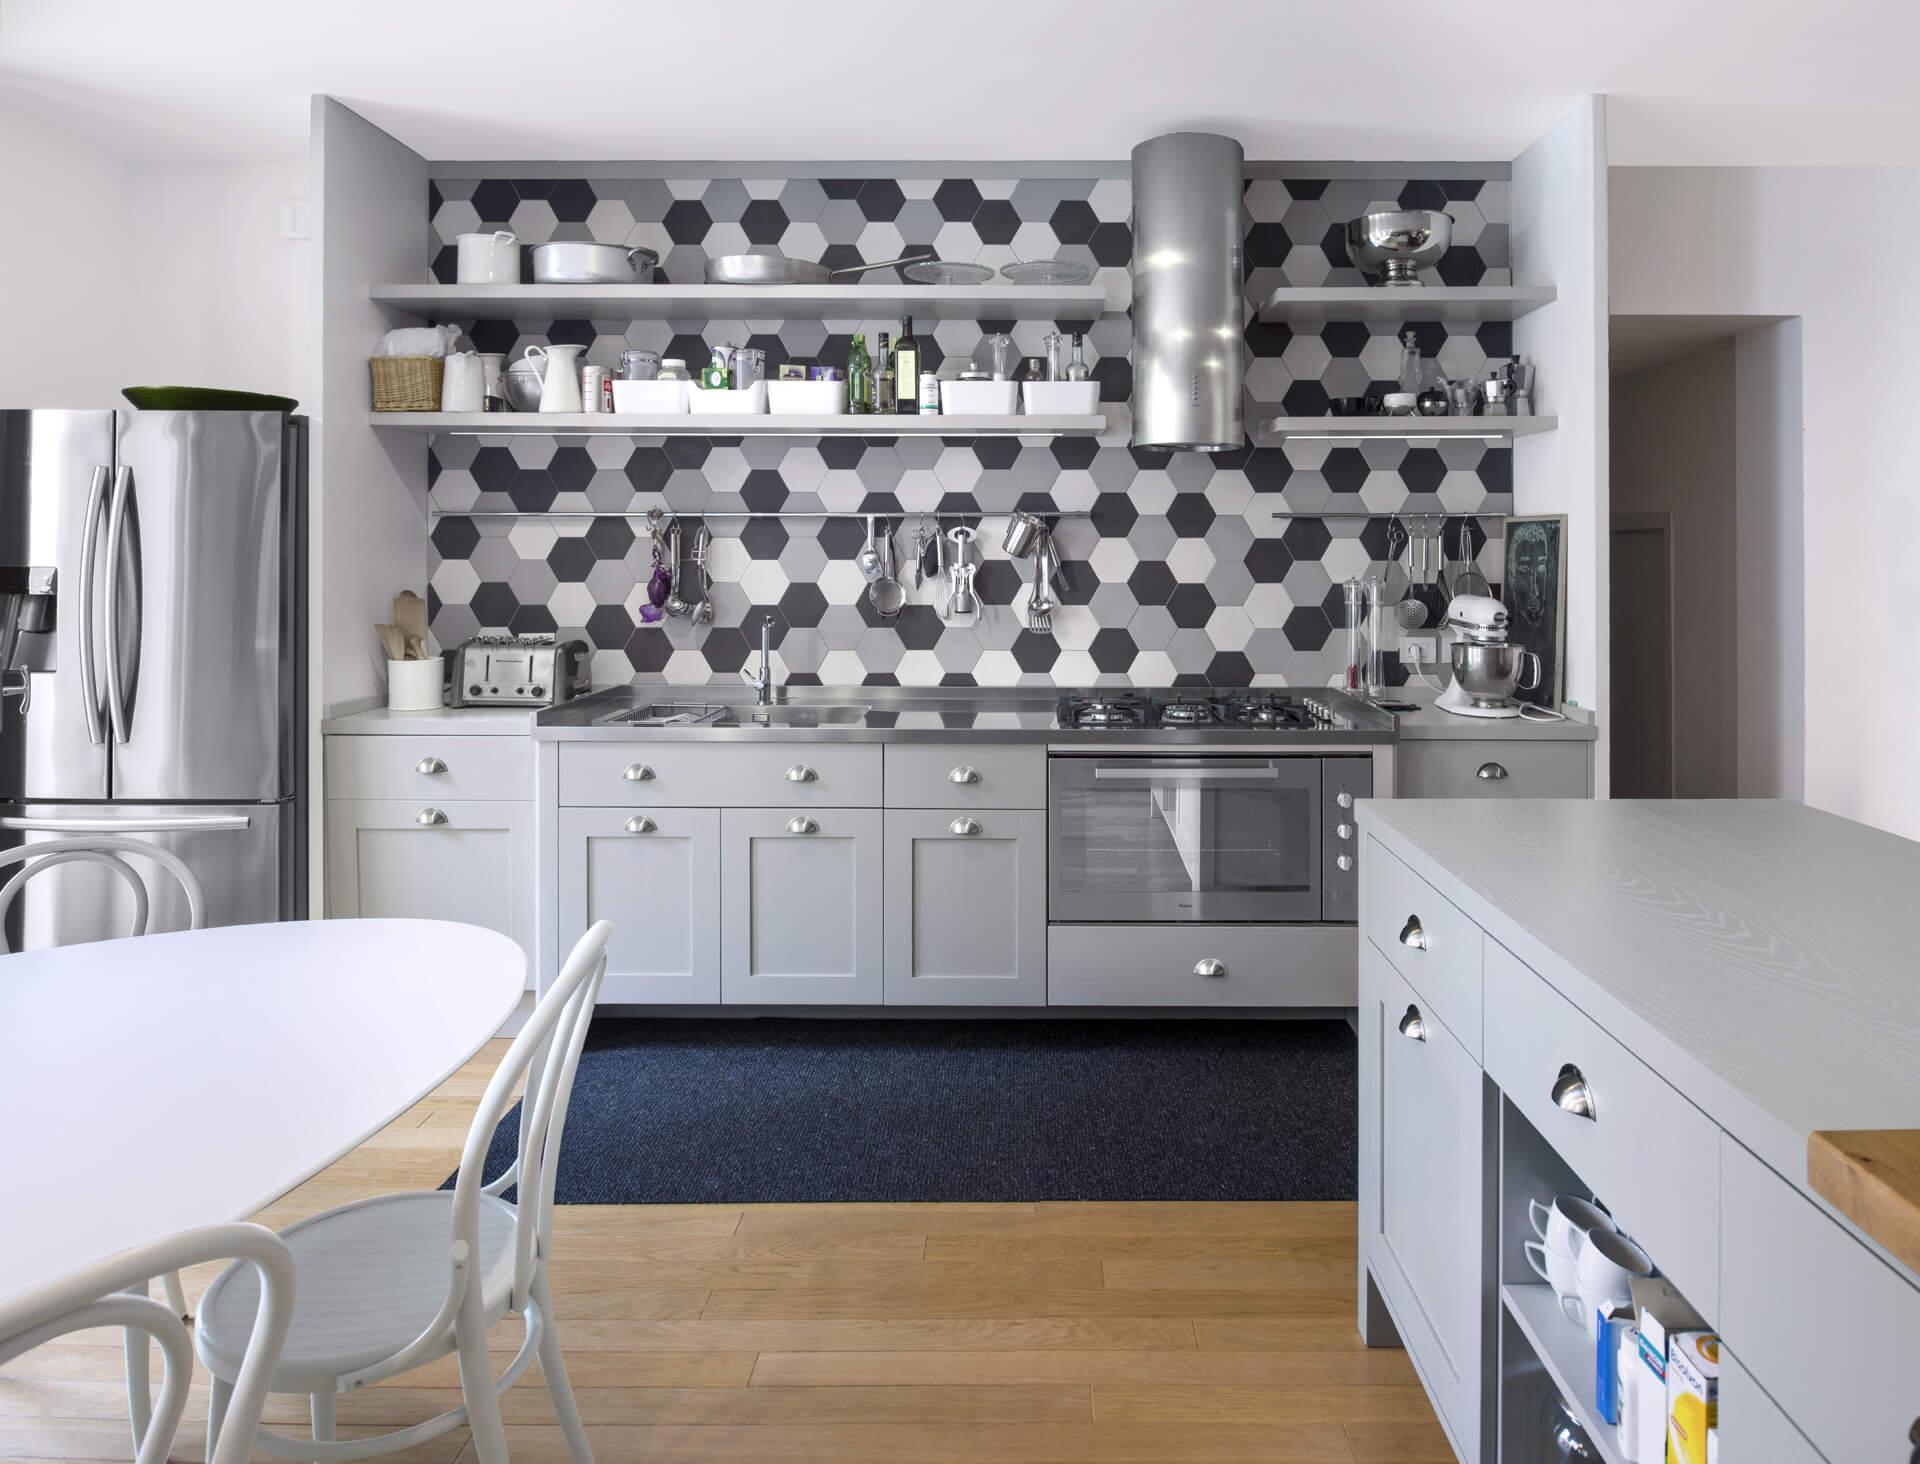 Mobili Contemporanei Cucina : Cucina contemporanea tortora arredamento cucine ardea pomezia